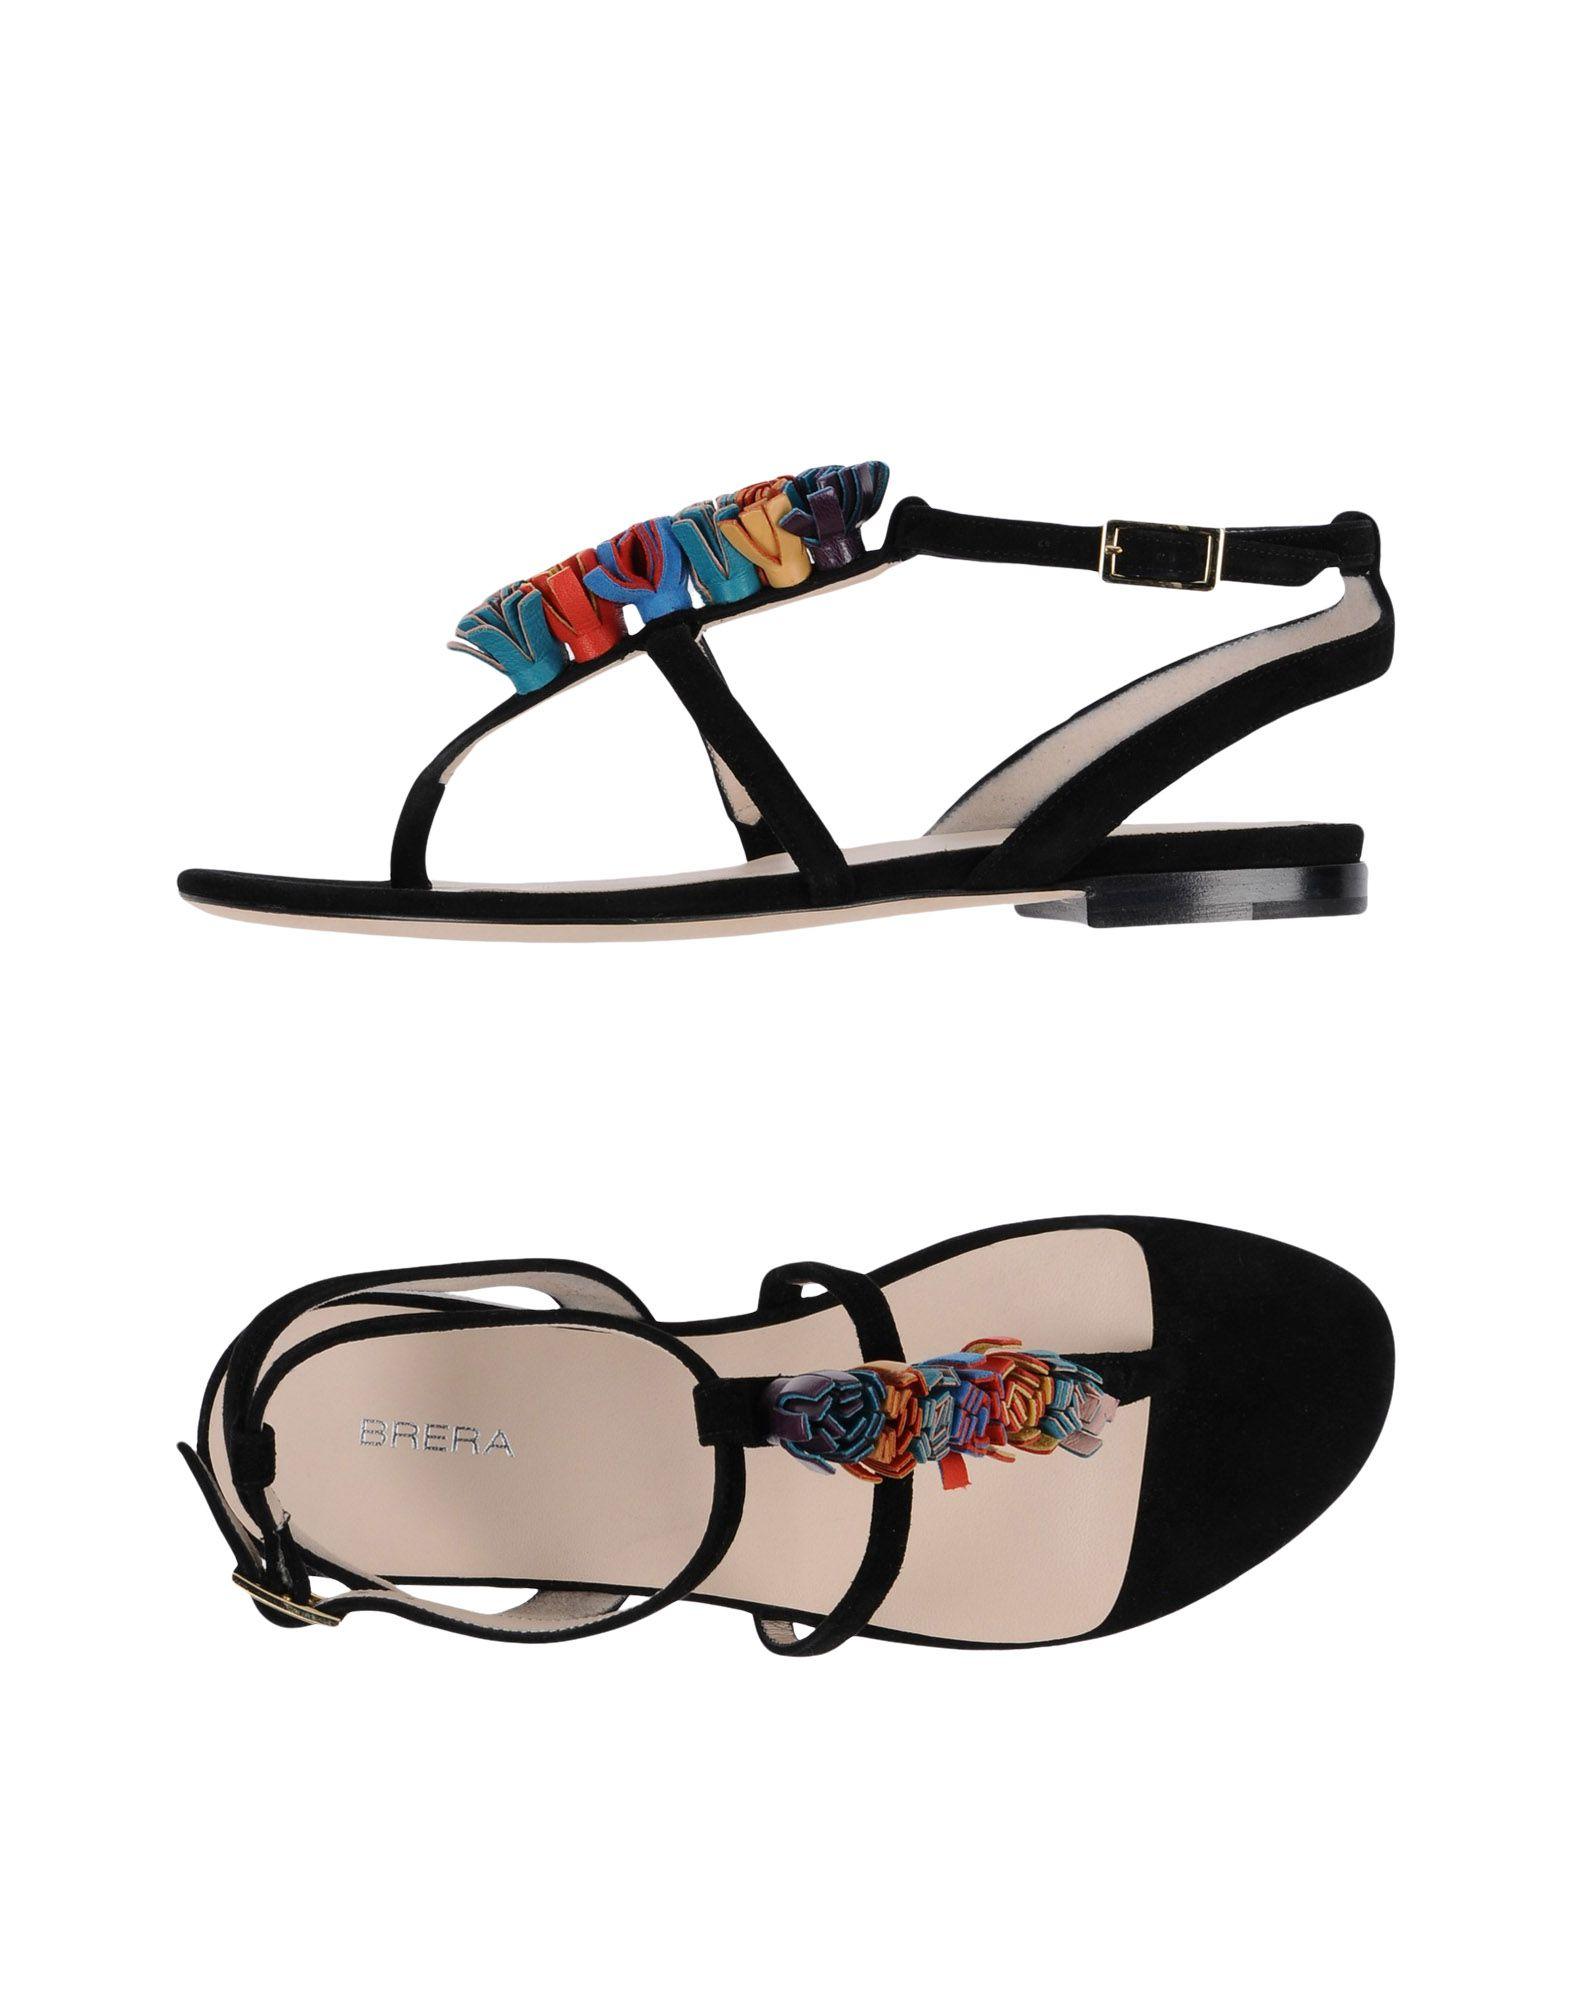 Brera Dianetten Damen  11396942KQ Gute Qualität beliebte Schuhe